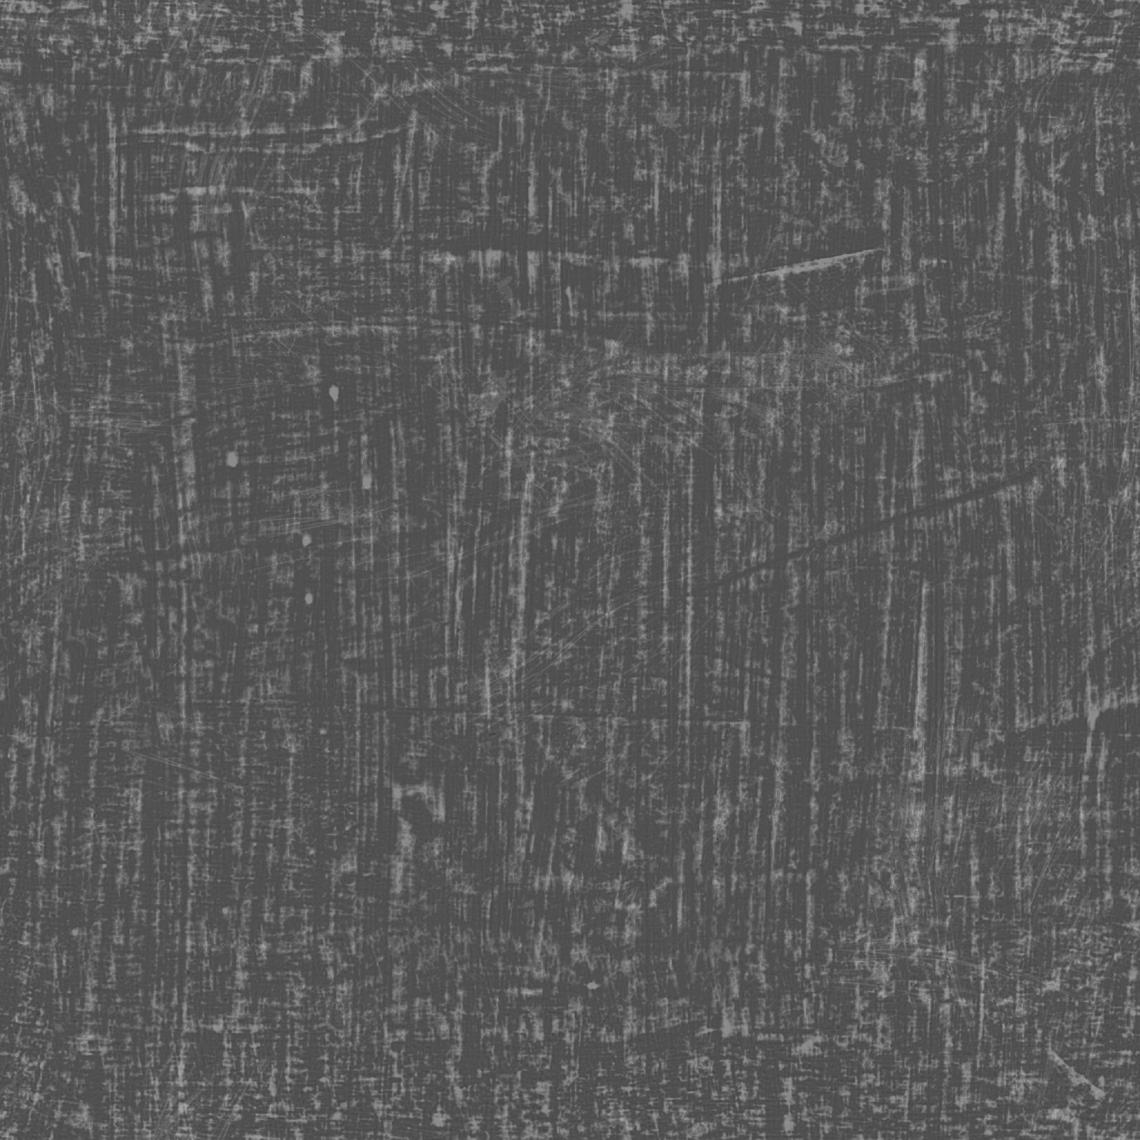 Wood-Plain-04-Roughness